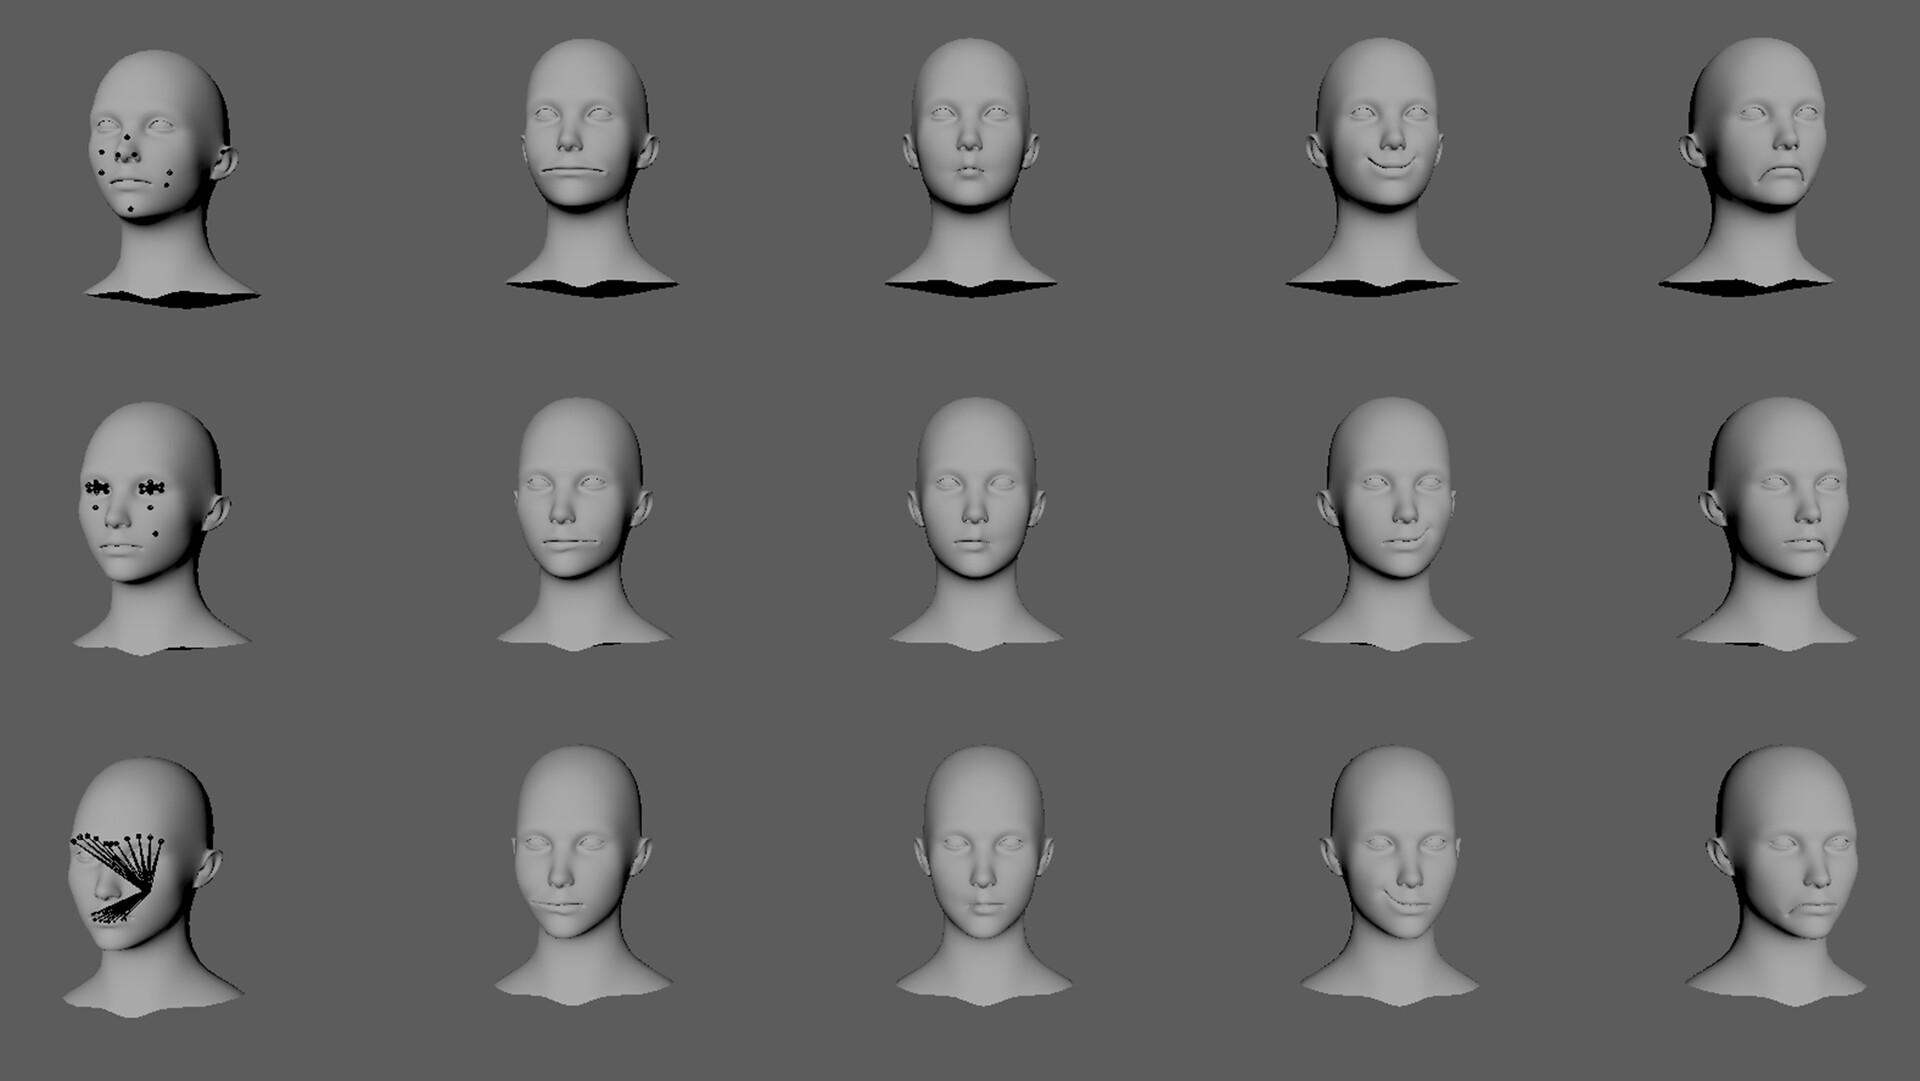 Blendshape Heads